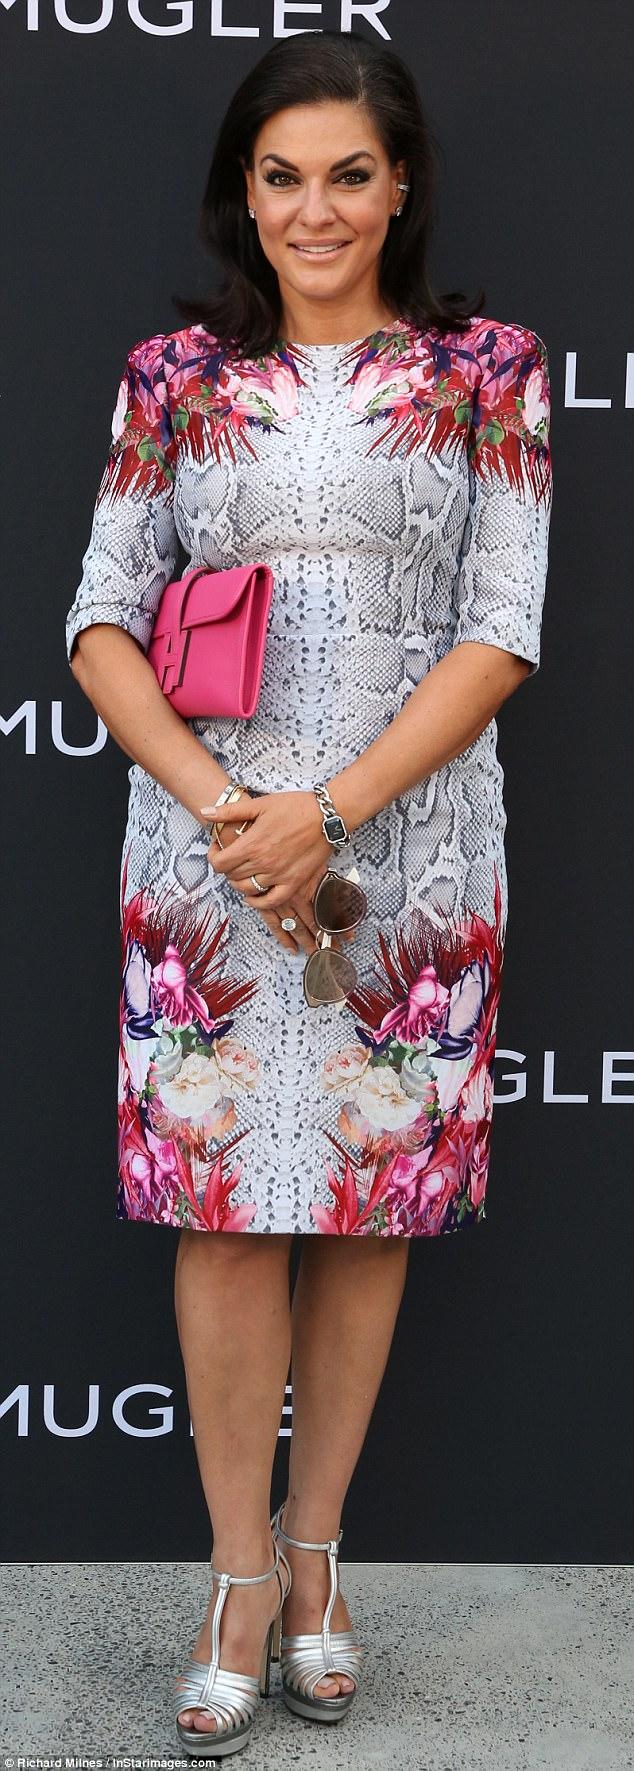 Nicole O'Neil at the Mugler Fragrance Launch.jpg